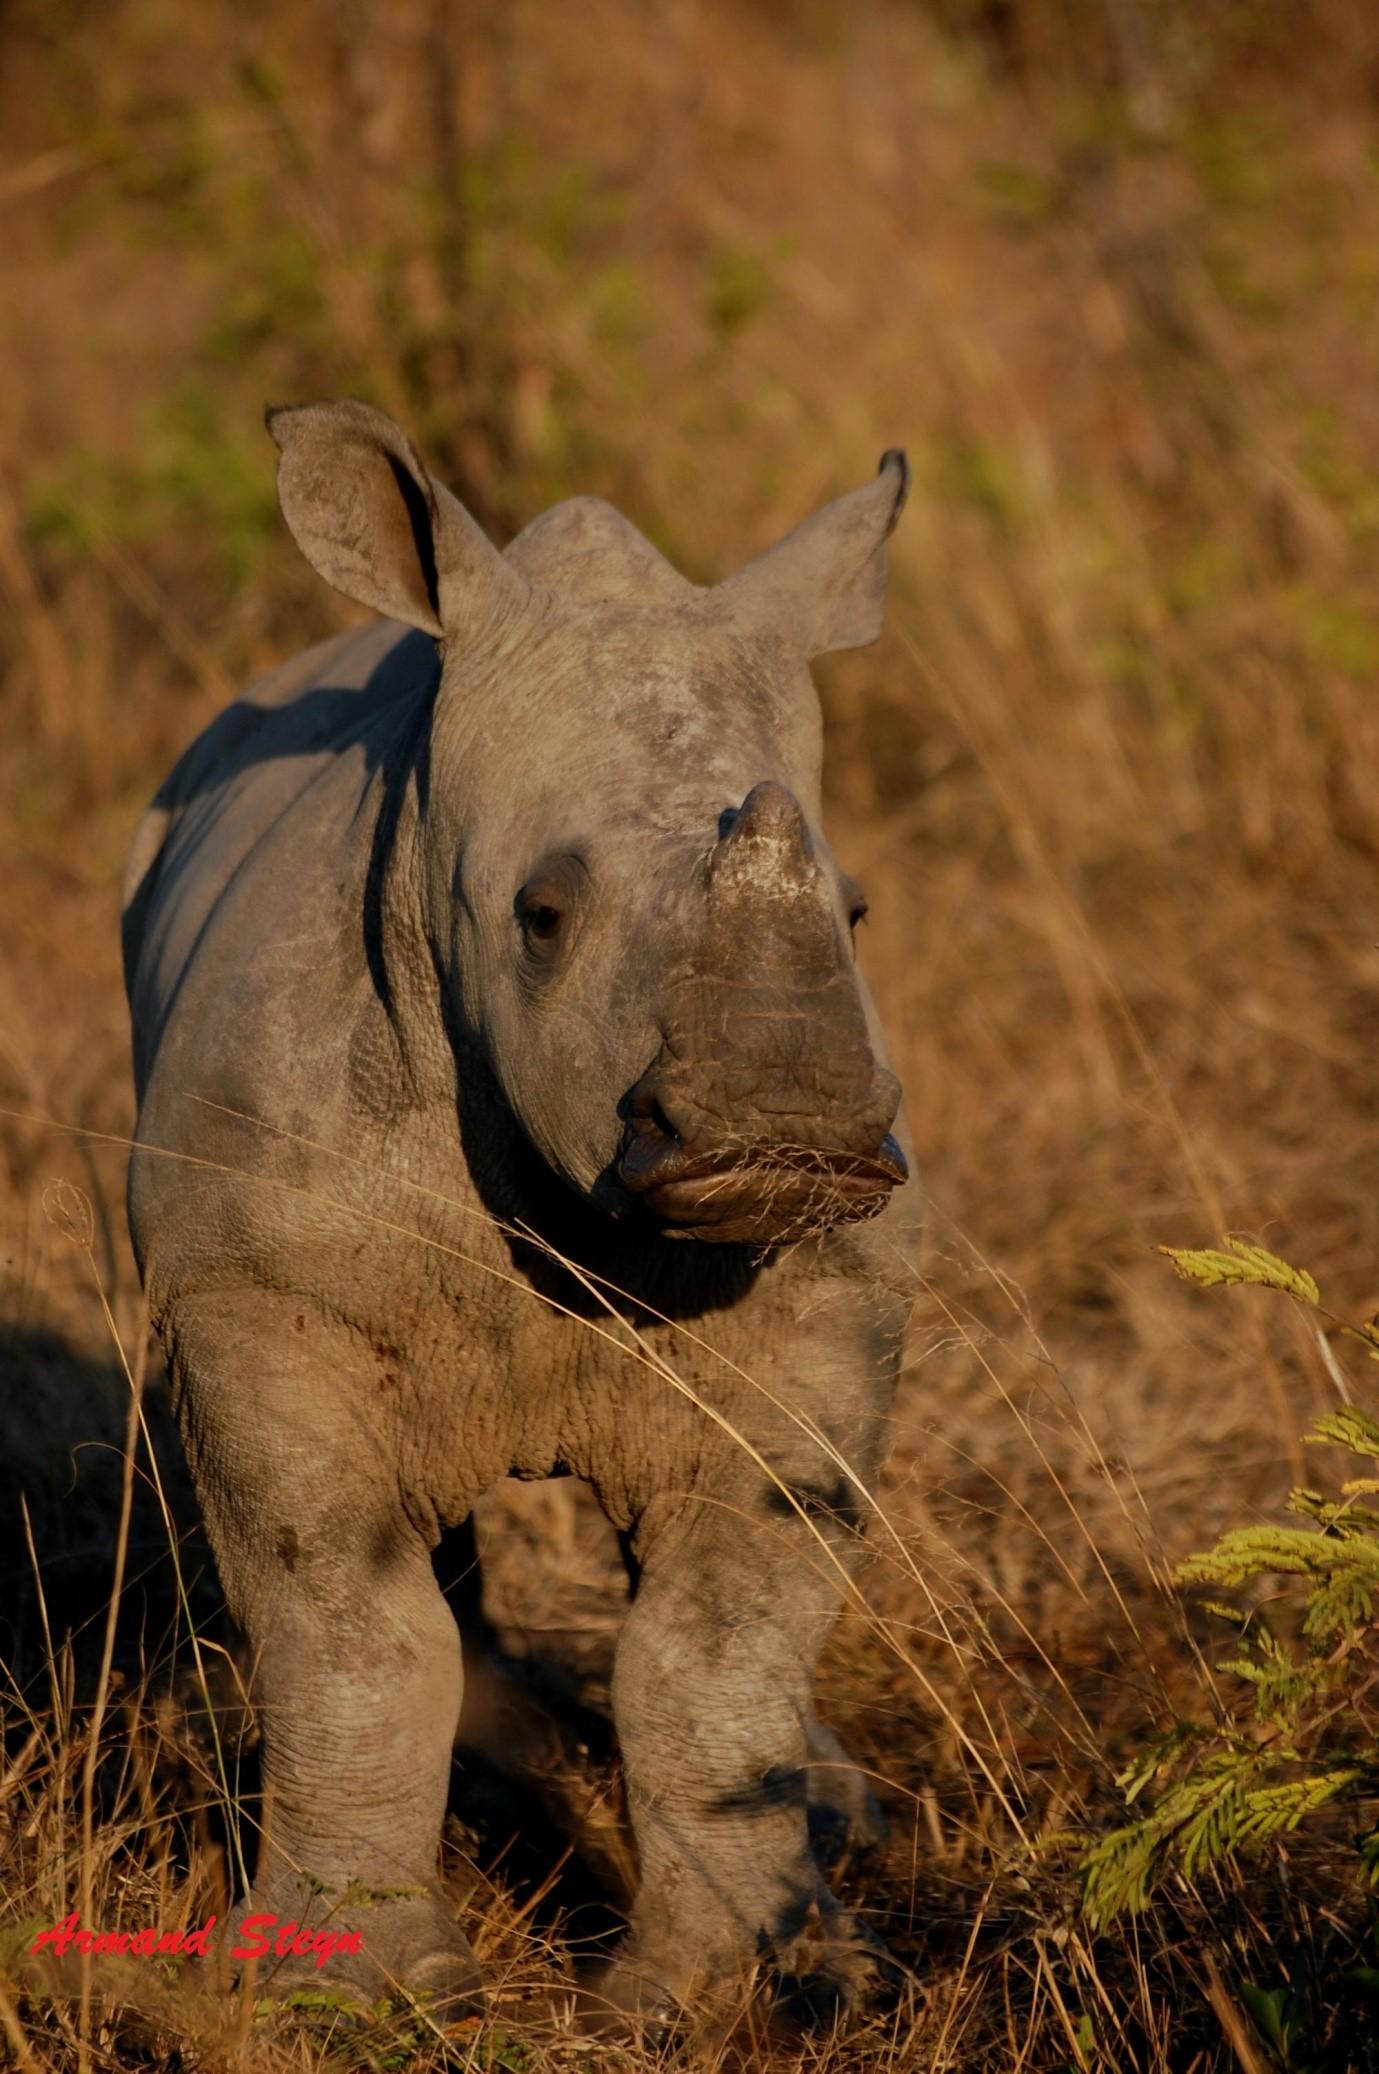 Rhino baby - photograph by Ranger Armand Steyn